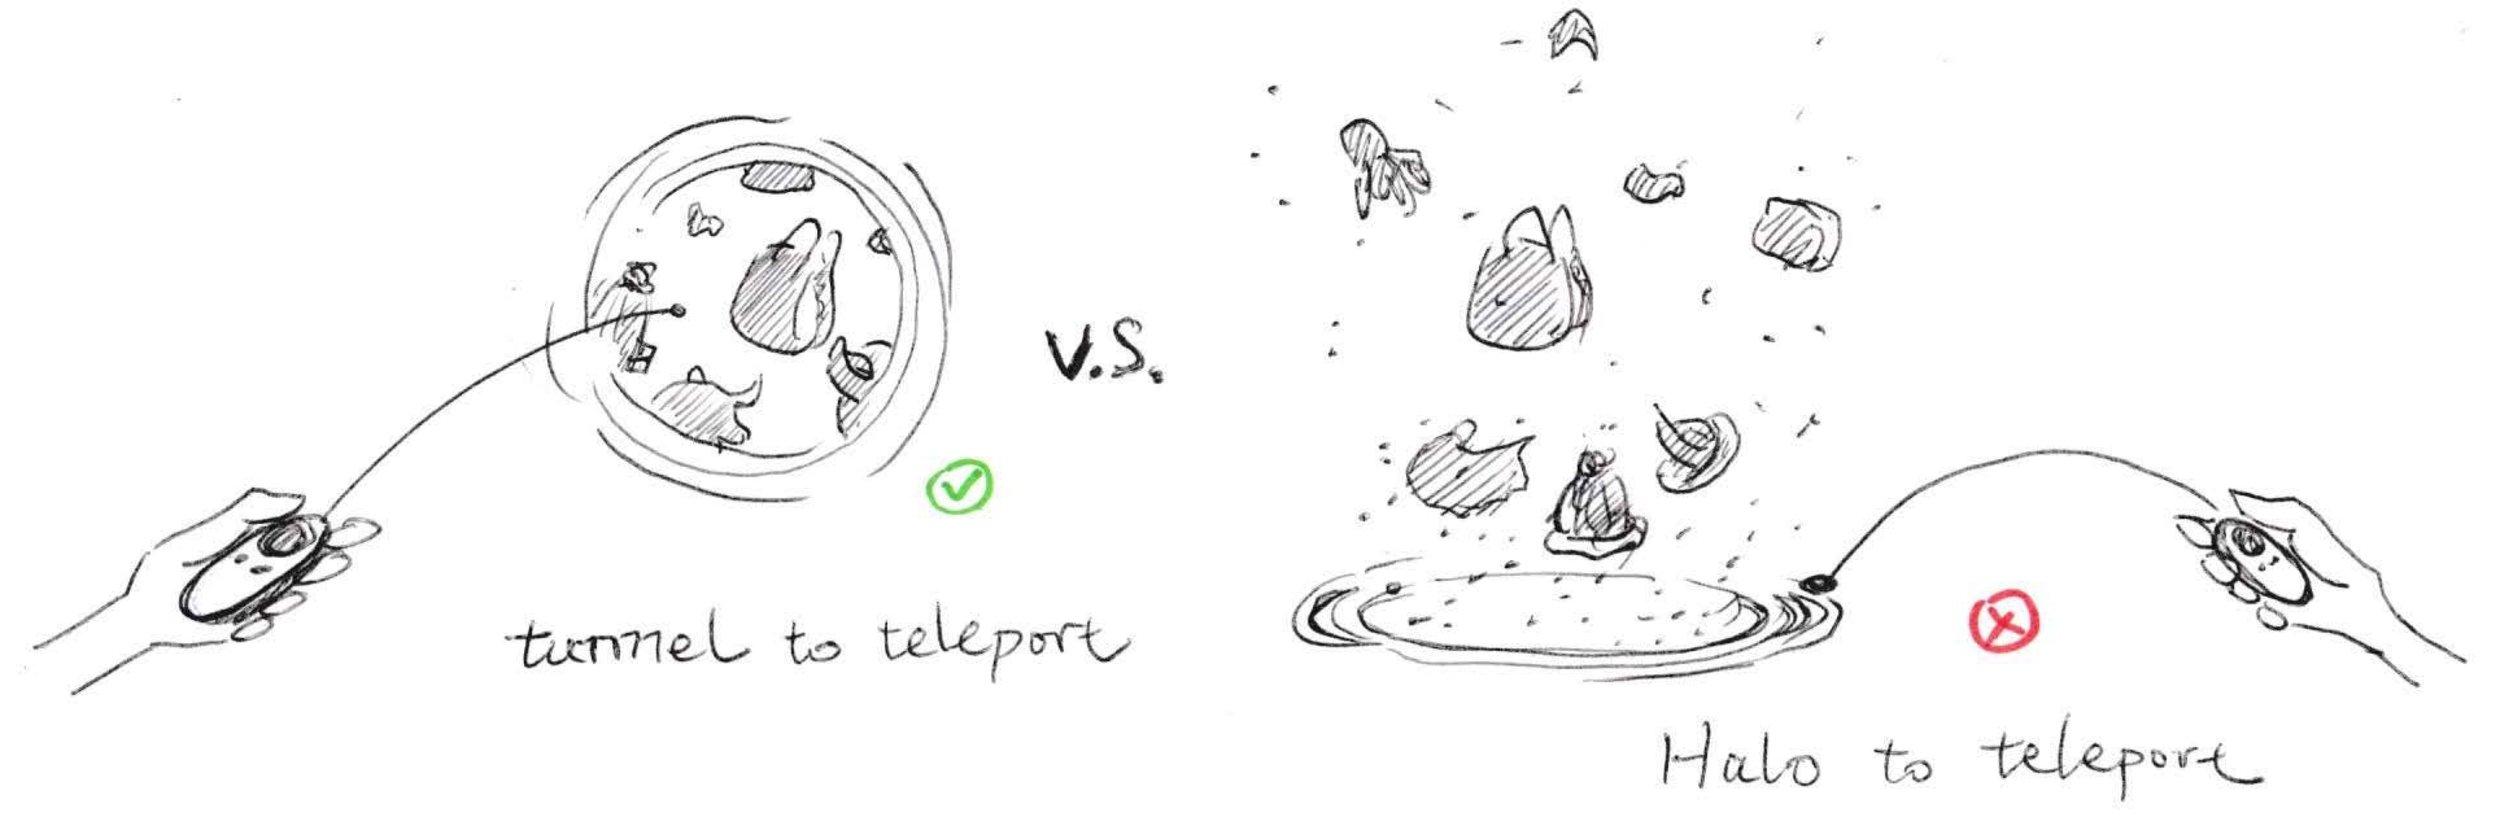 BoutiqueTeleport_Sketch1.jpg